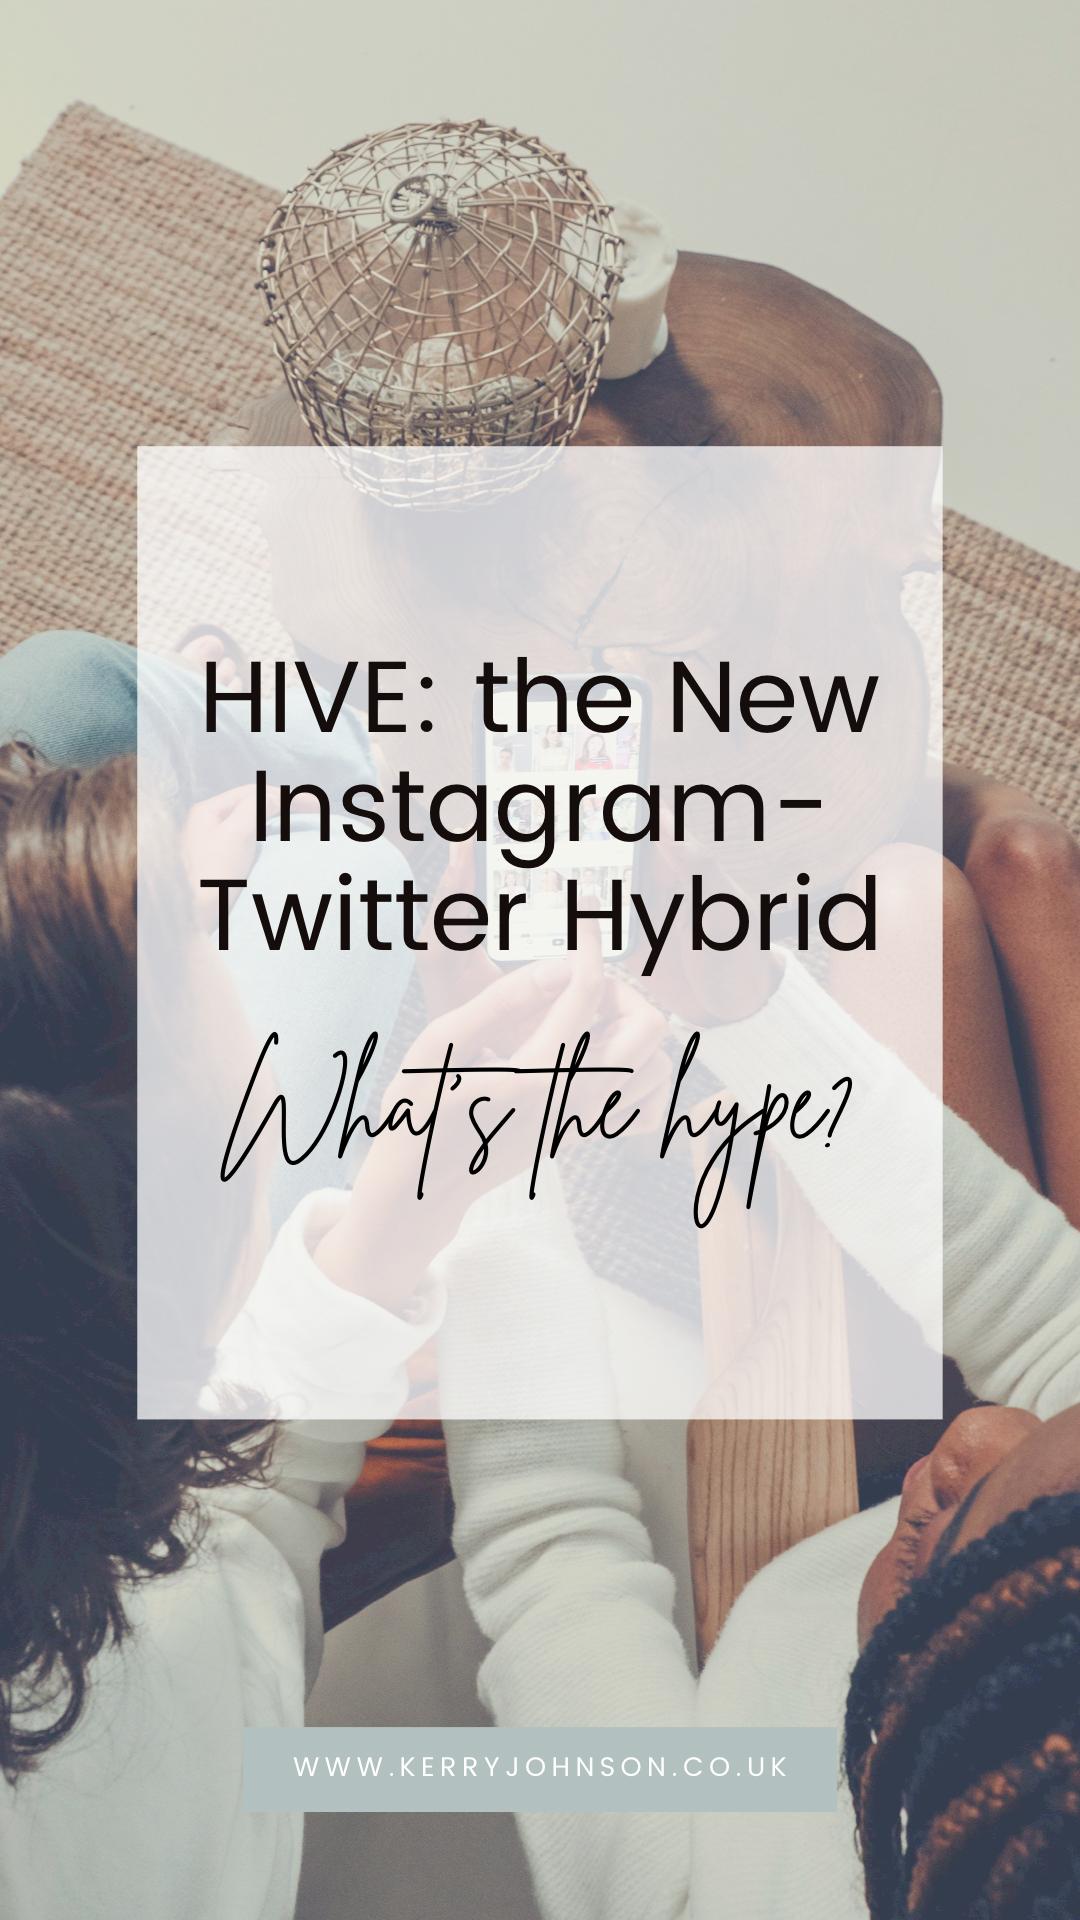 HIVE: the New Instagram-Twitter Hybrid | KerryJohnson.co.uk